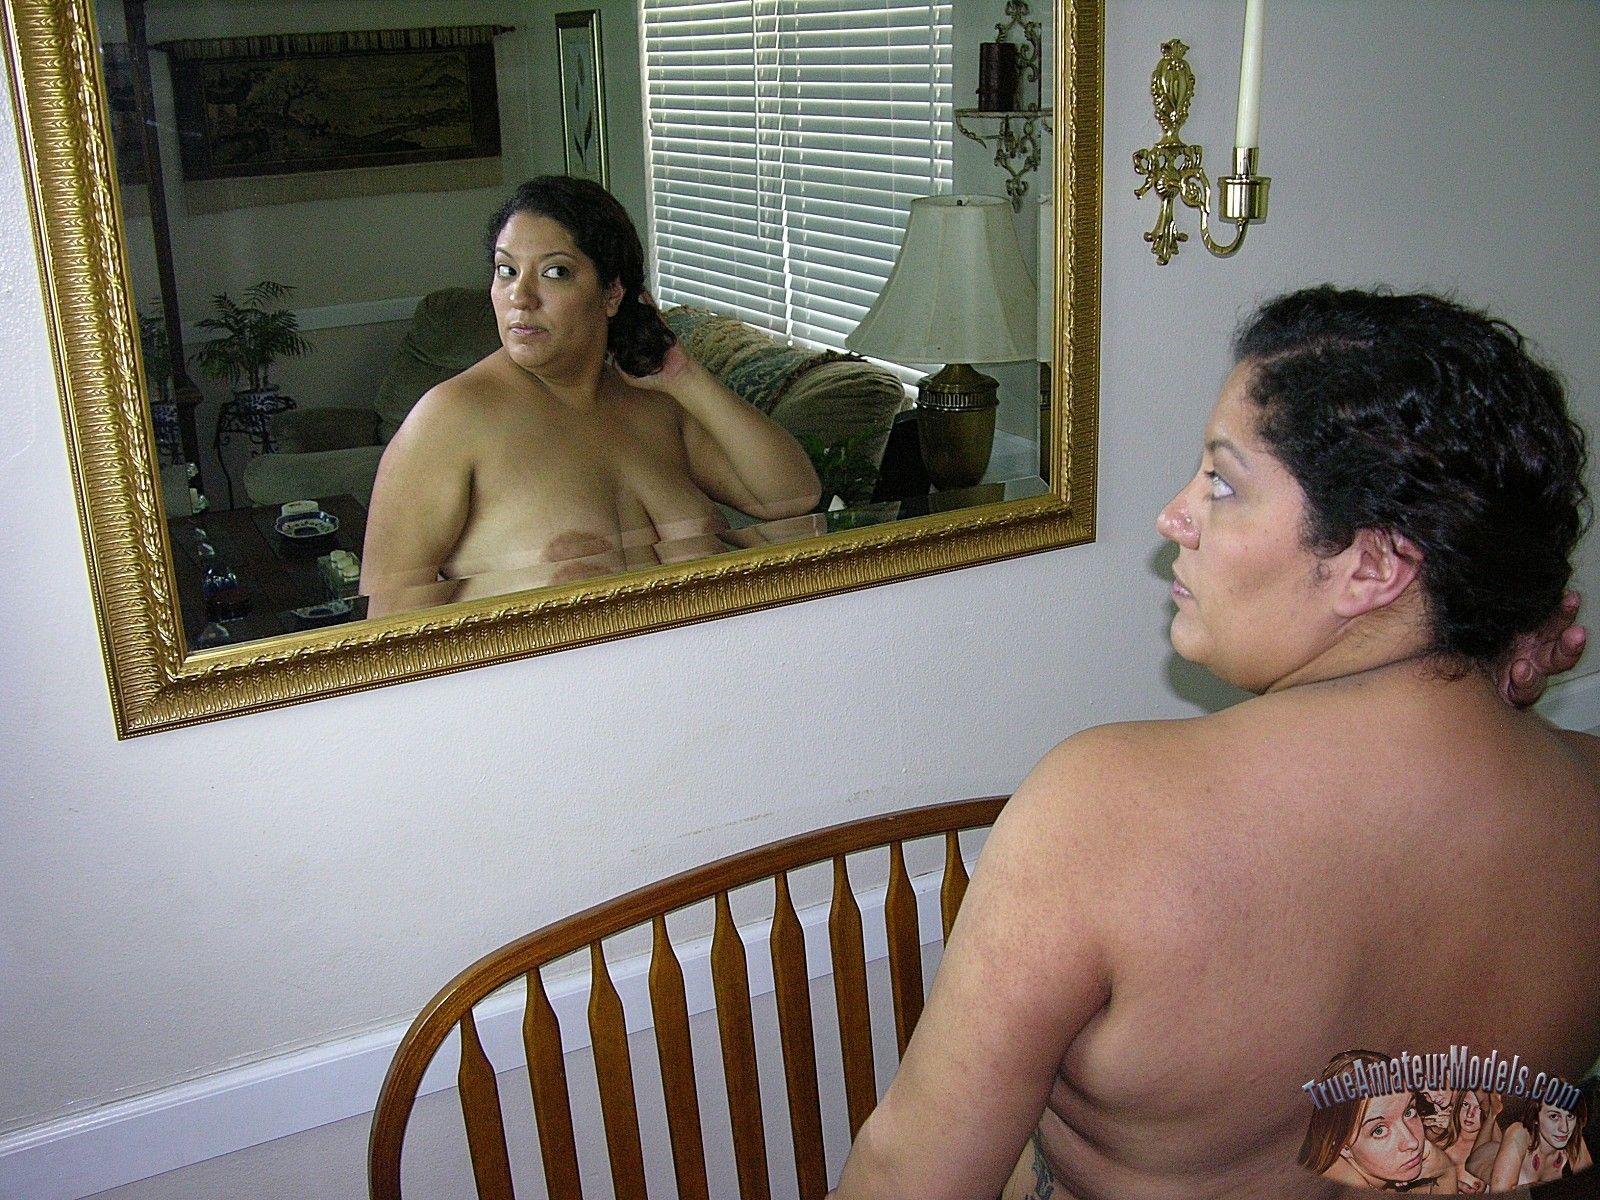 Last man alive erotic story